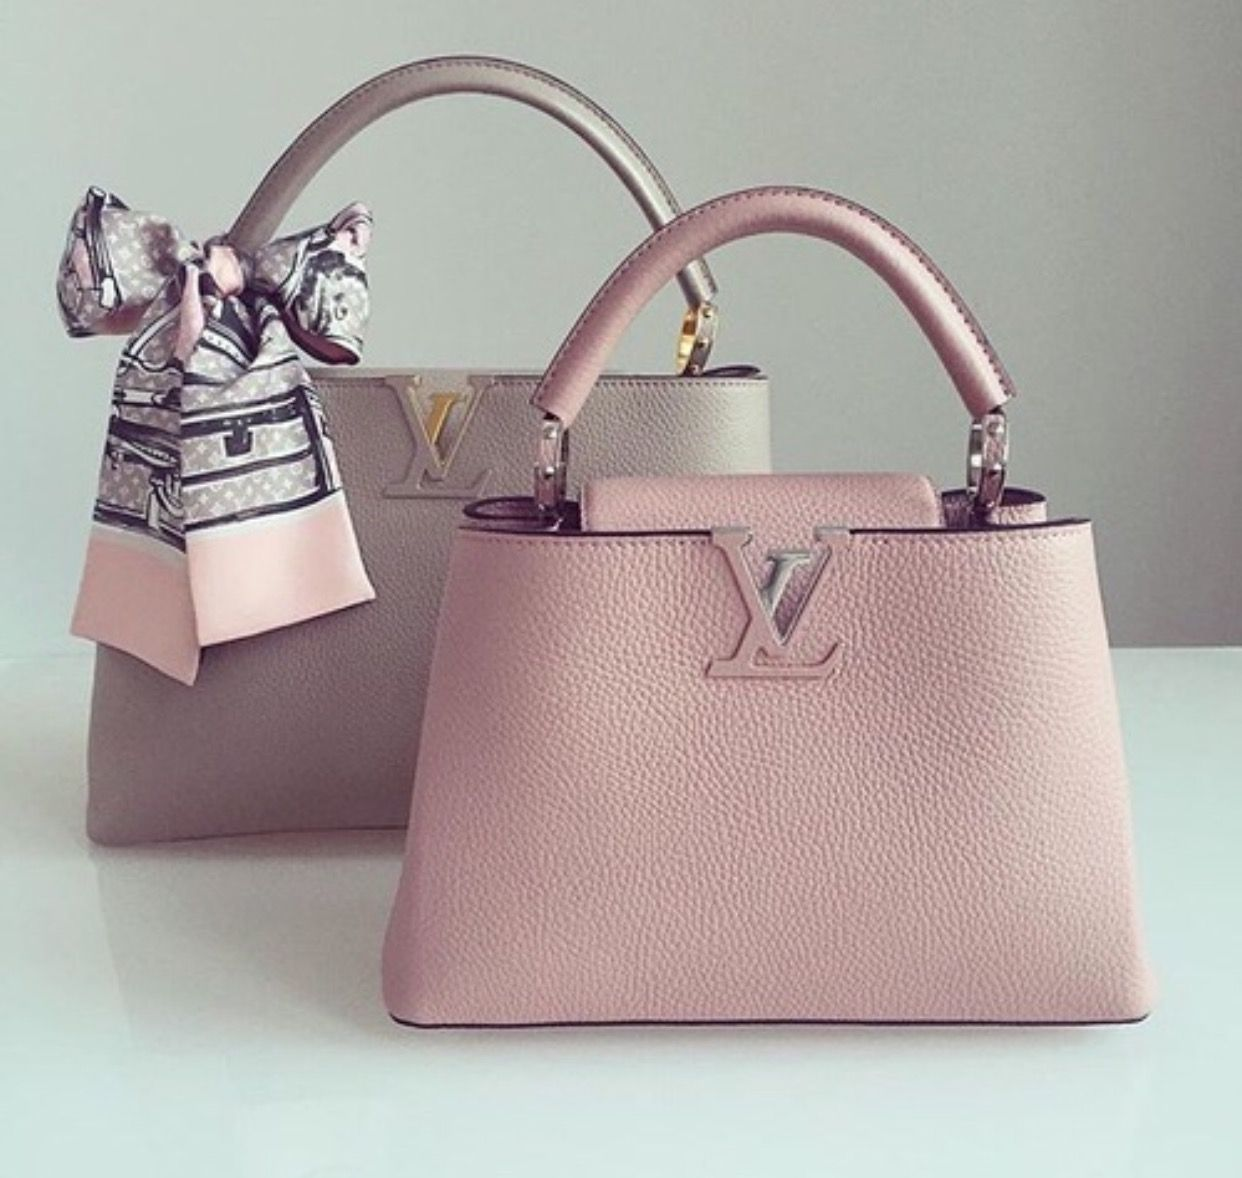 ♛ Pinterest: @niazesantos ♡ ♛ http://www.allthingsvogue.com/best-stylish- tote-bags/ | Vuitton bag, Spring handbags, Louis vuitton bag